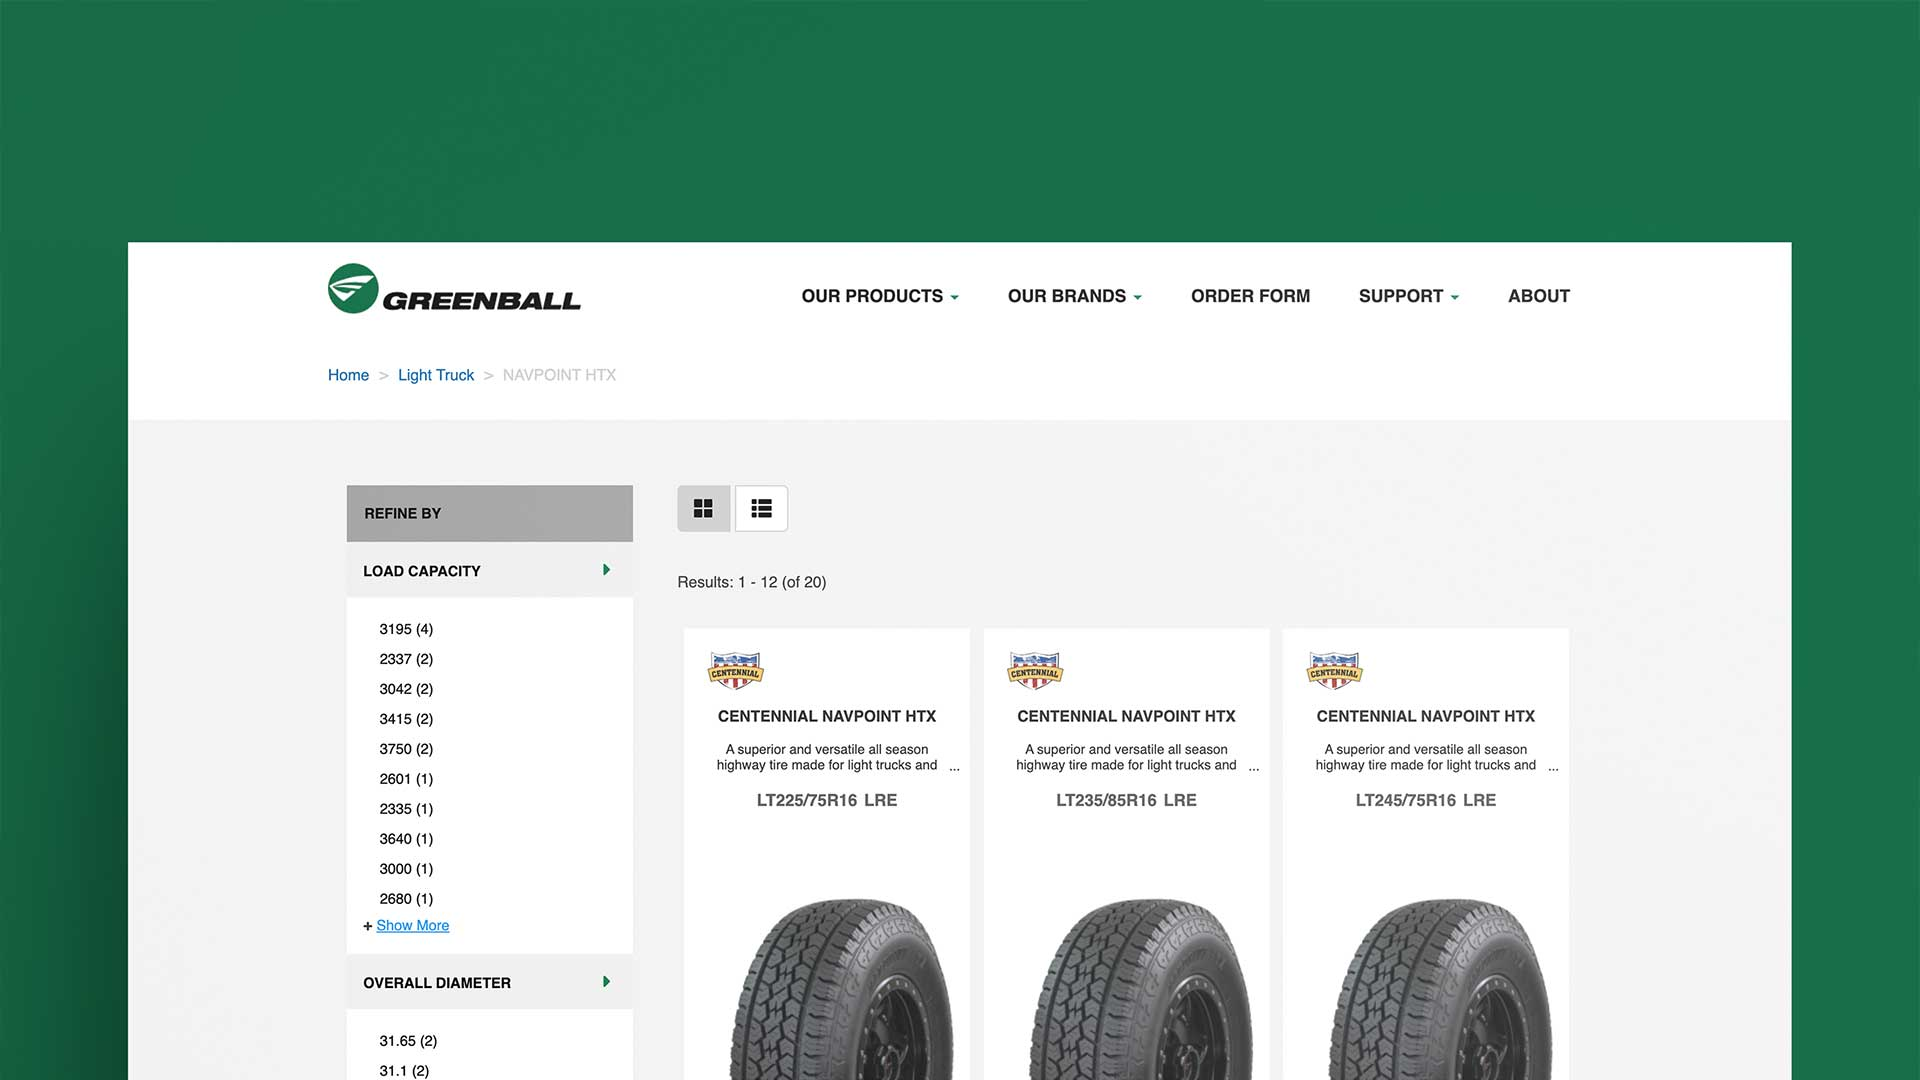 Greenball Tires